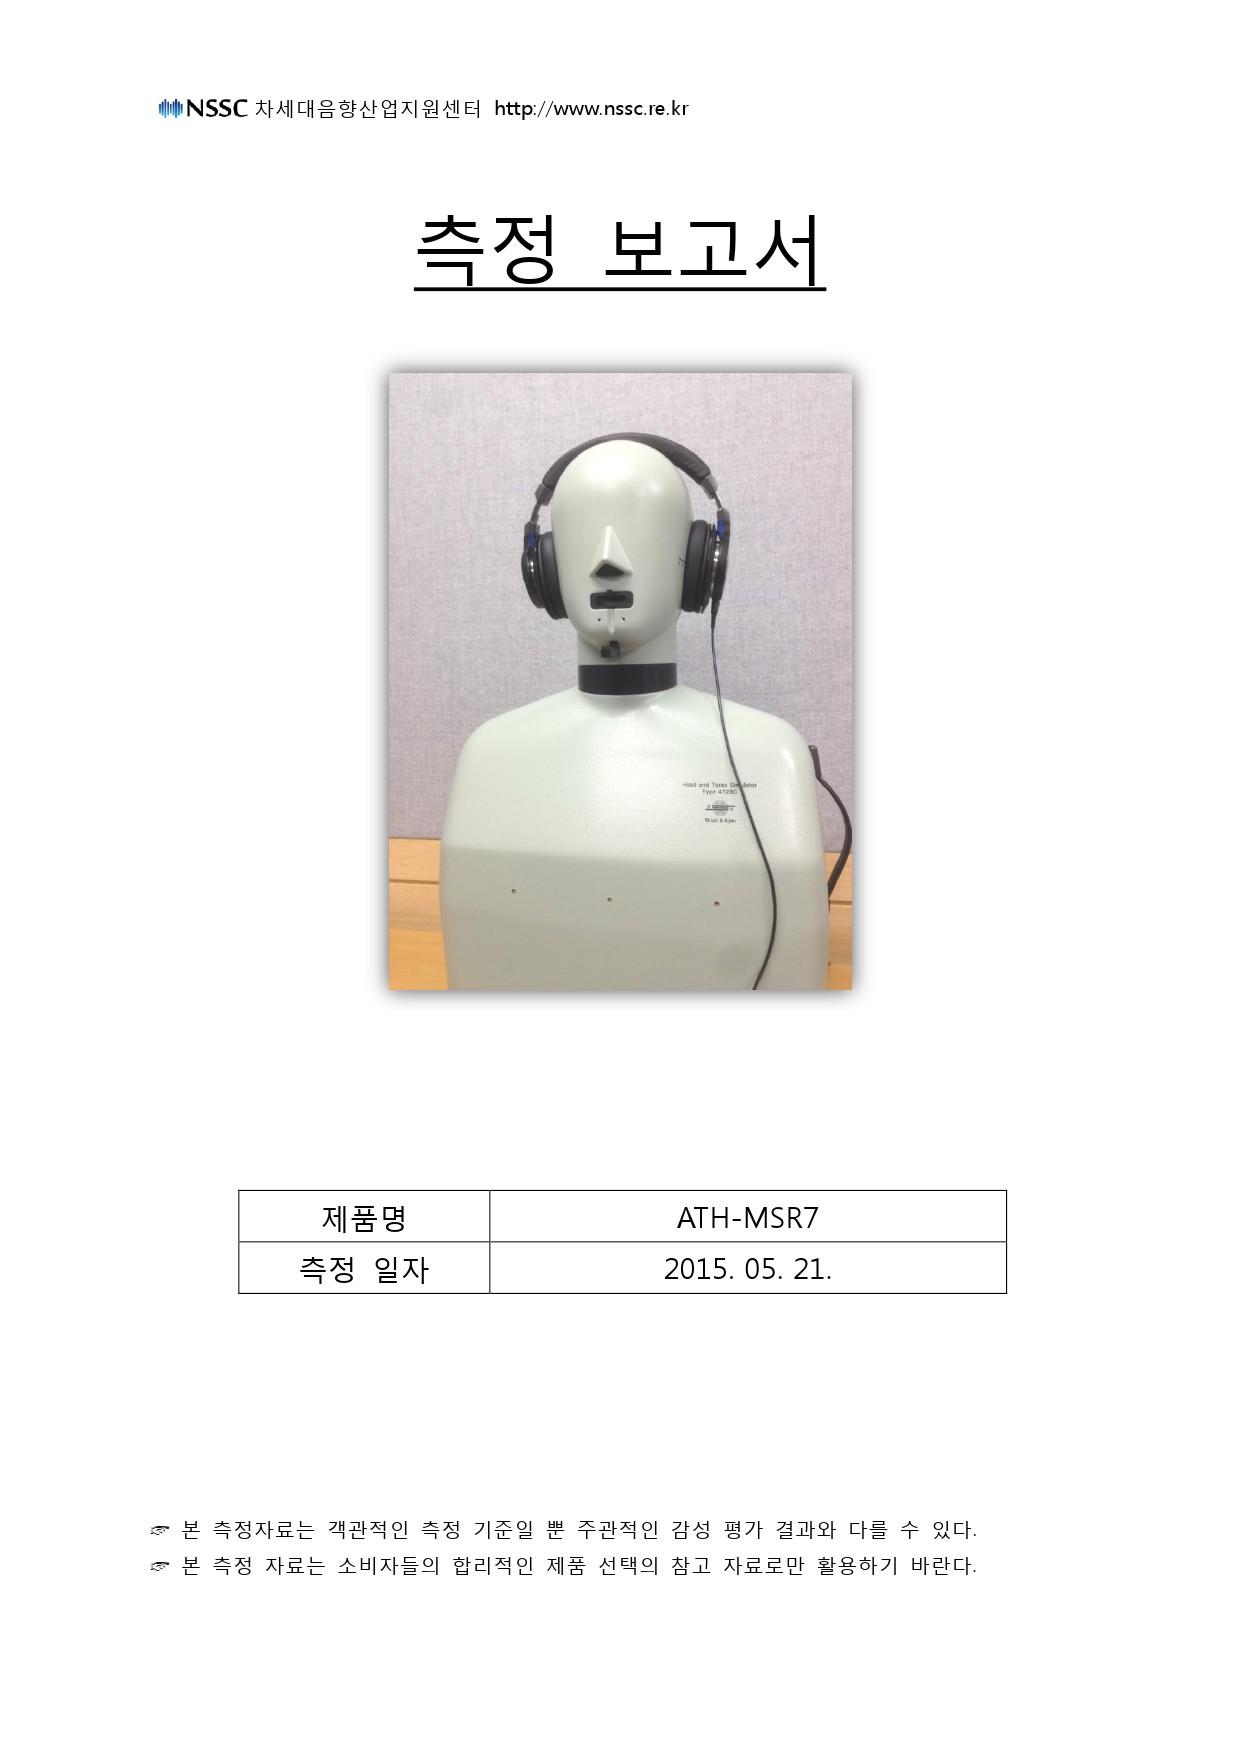 Audio-technica-MSR7-1.jpg